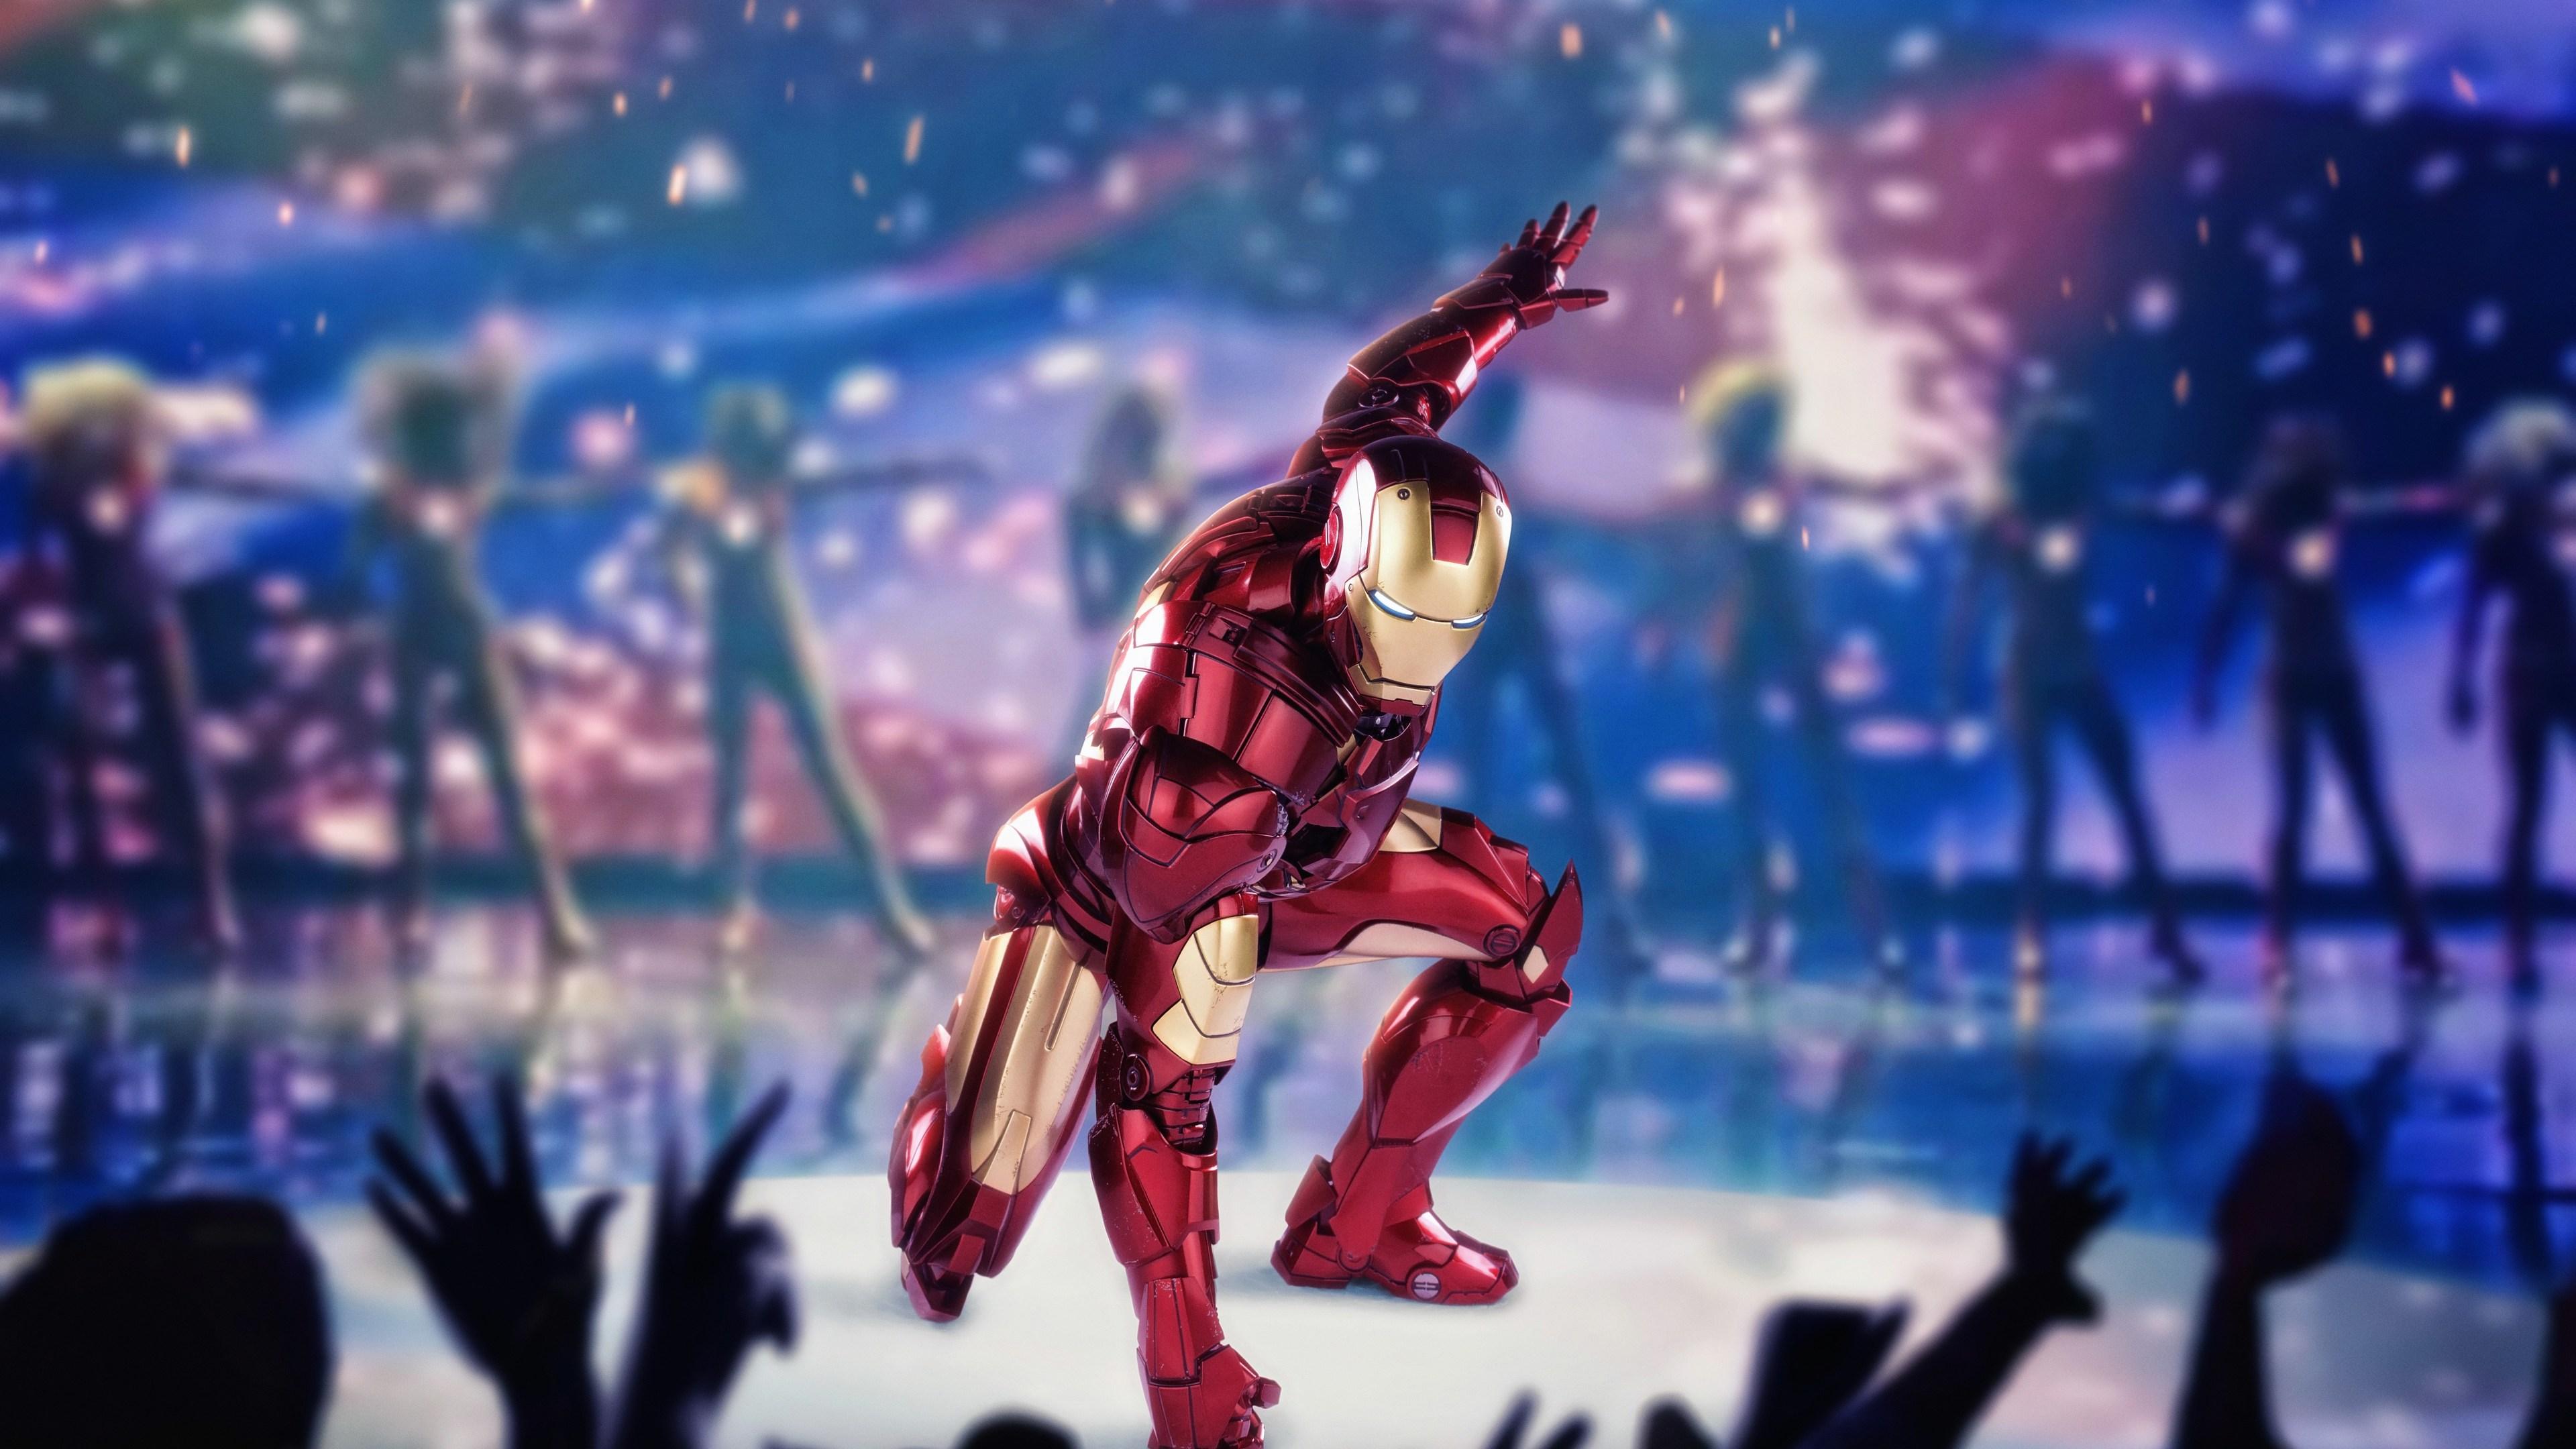 iron man 4k 2018 1543619981 - Iron Man 4k 2018 - superheroes wallpapers, iron man wallpapers, hd-wallpapers, 4k-wallpapers